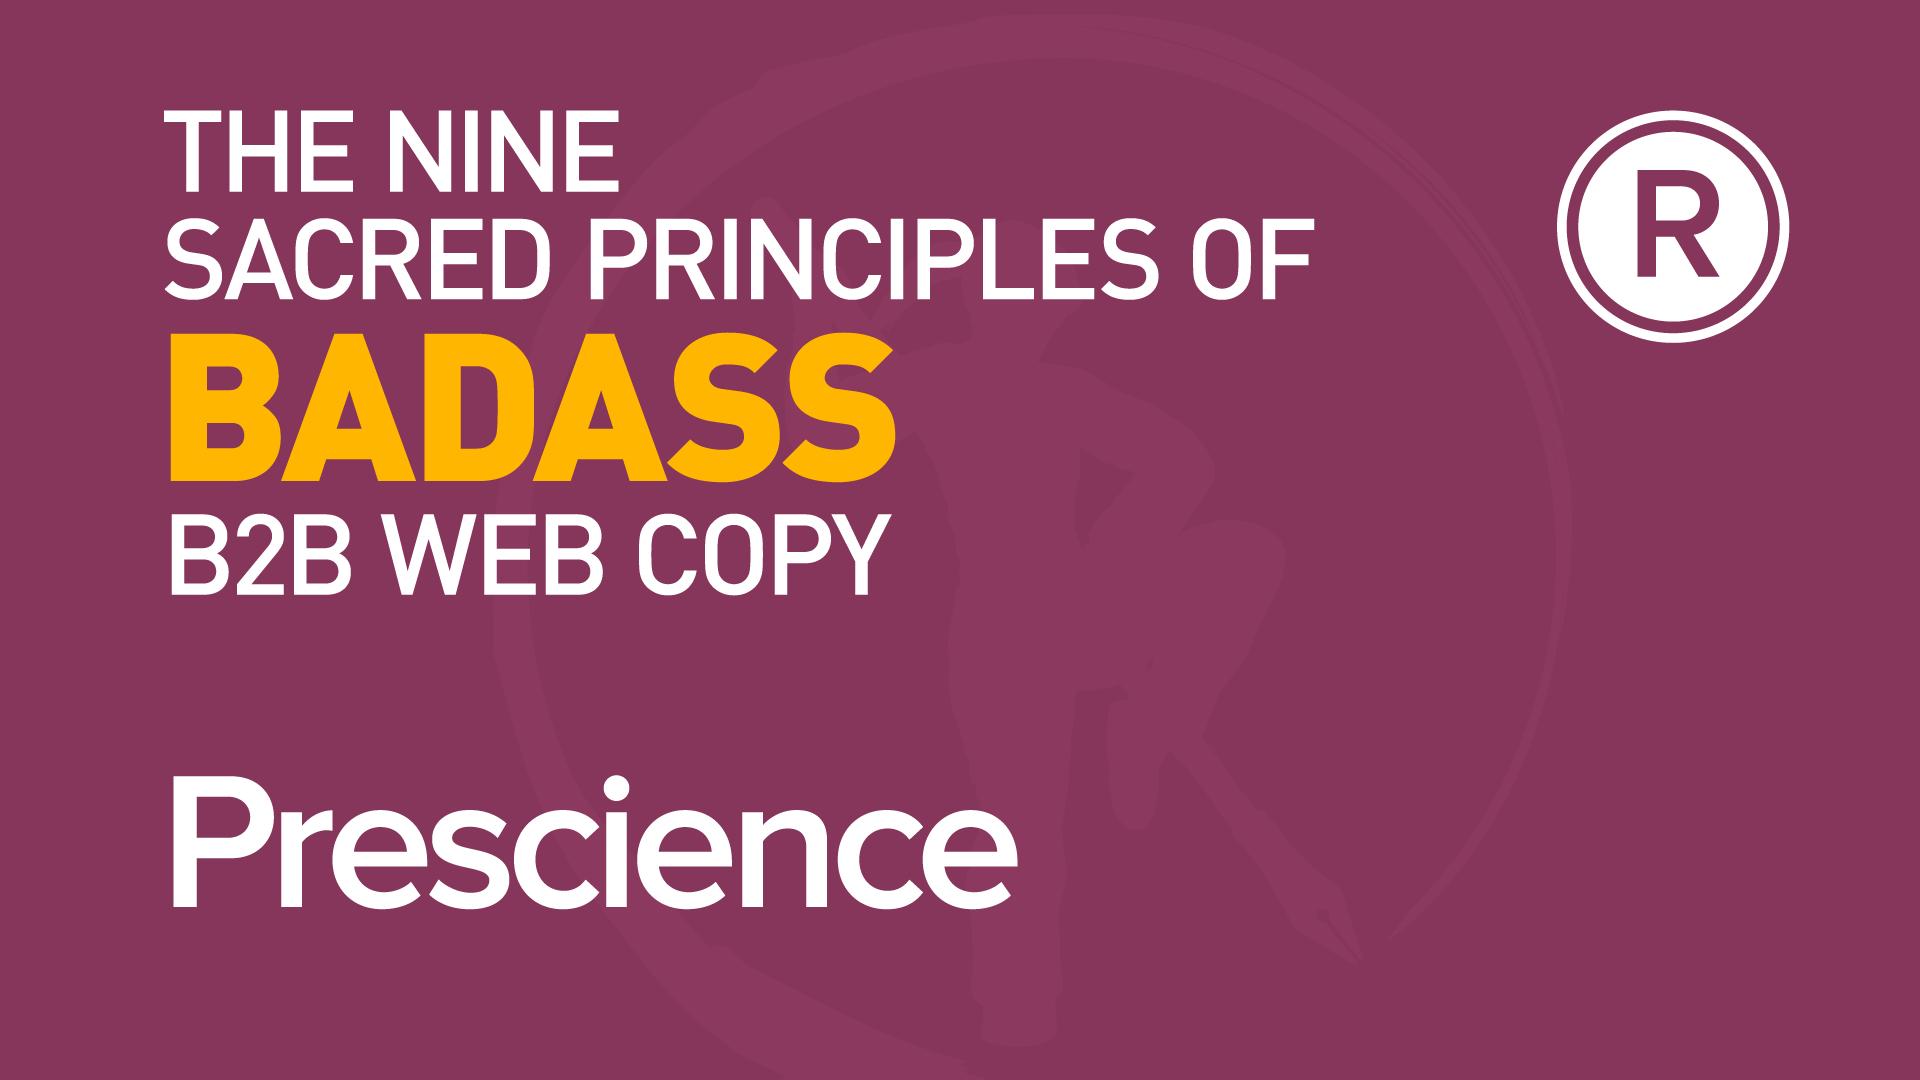 8th principle of badass B2B web copy: Prescience